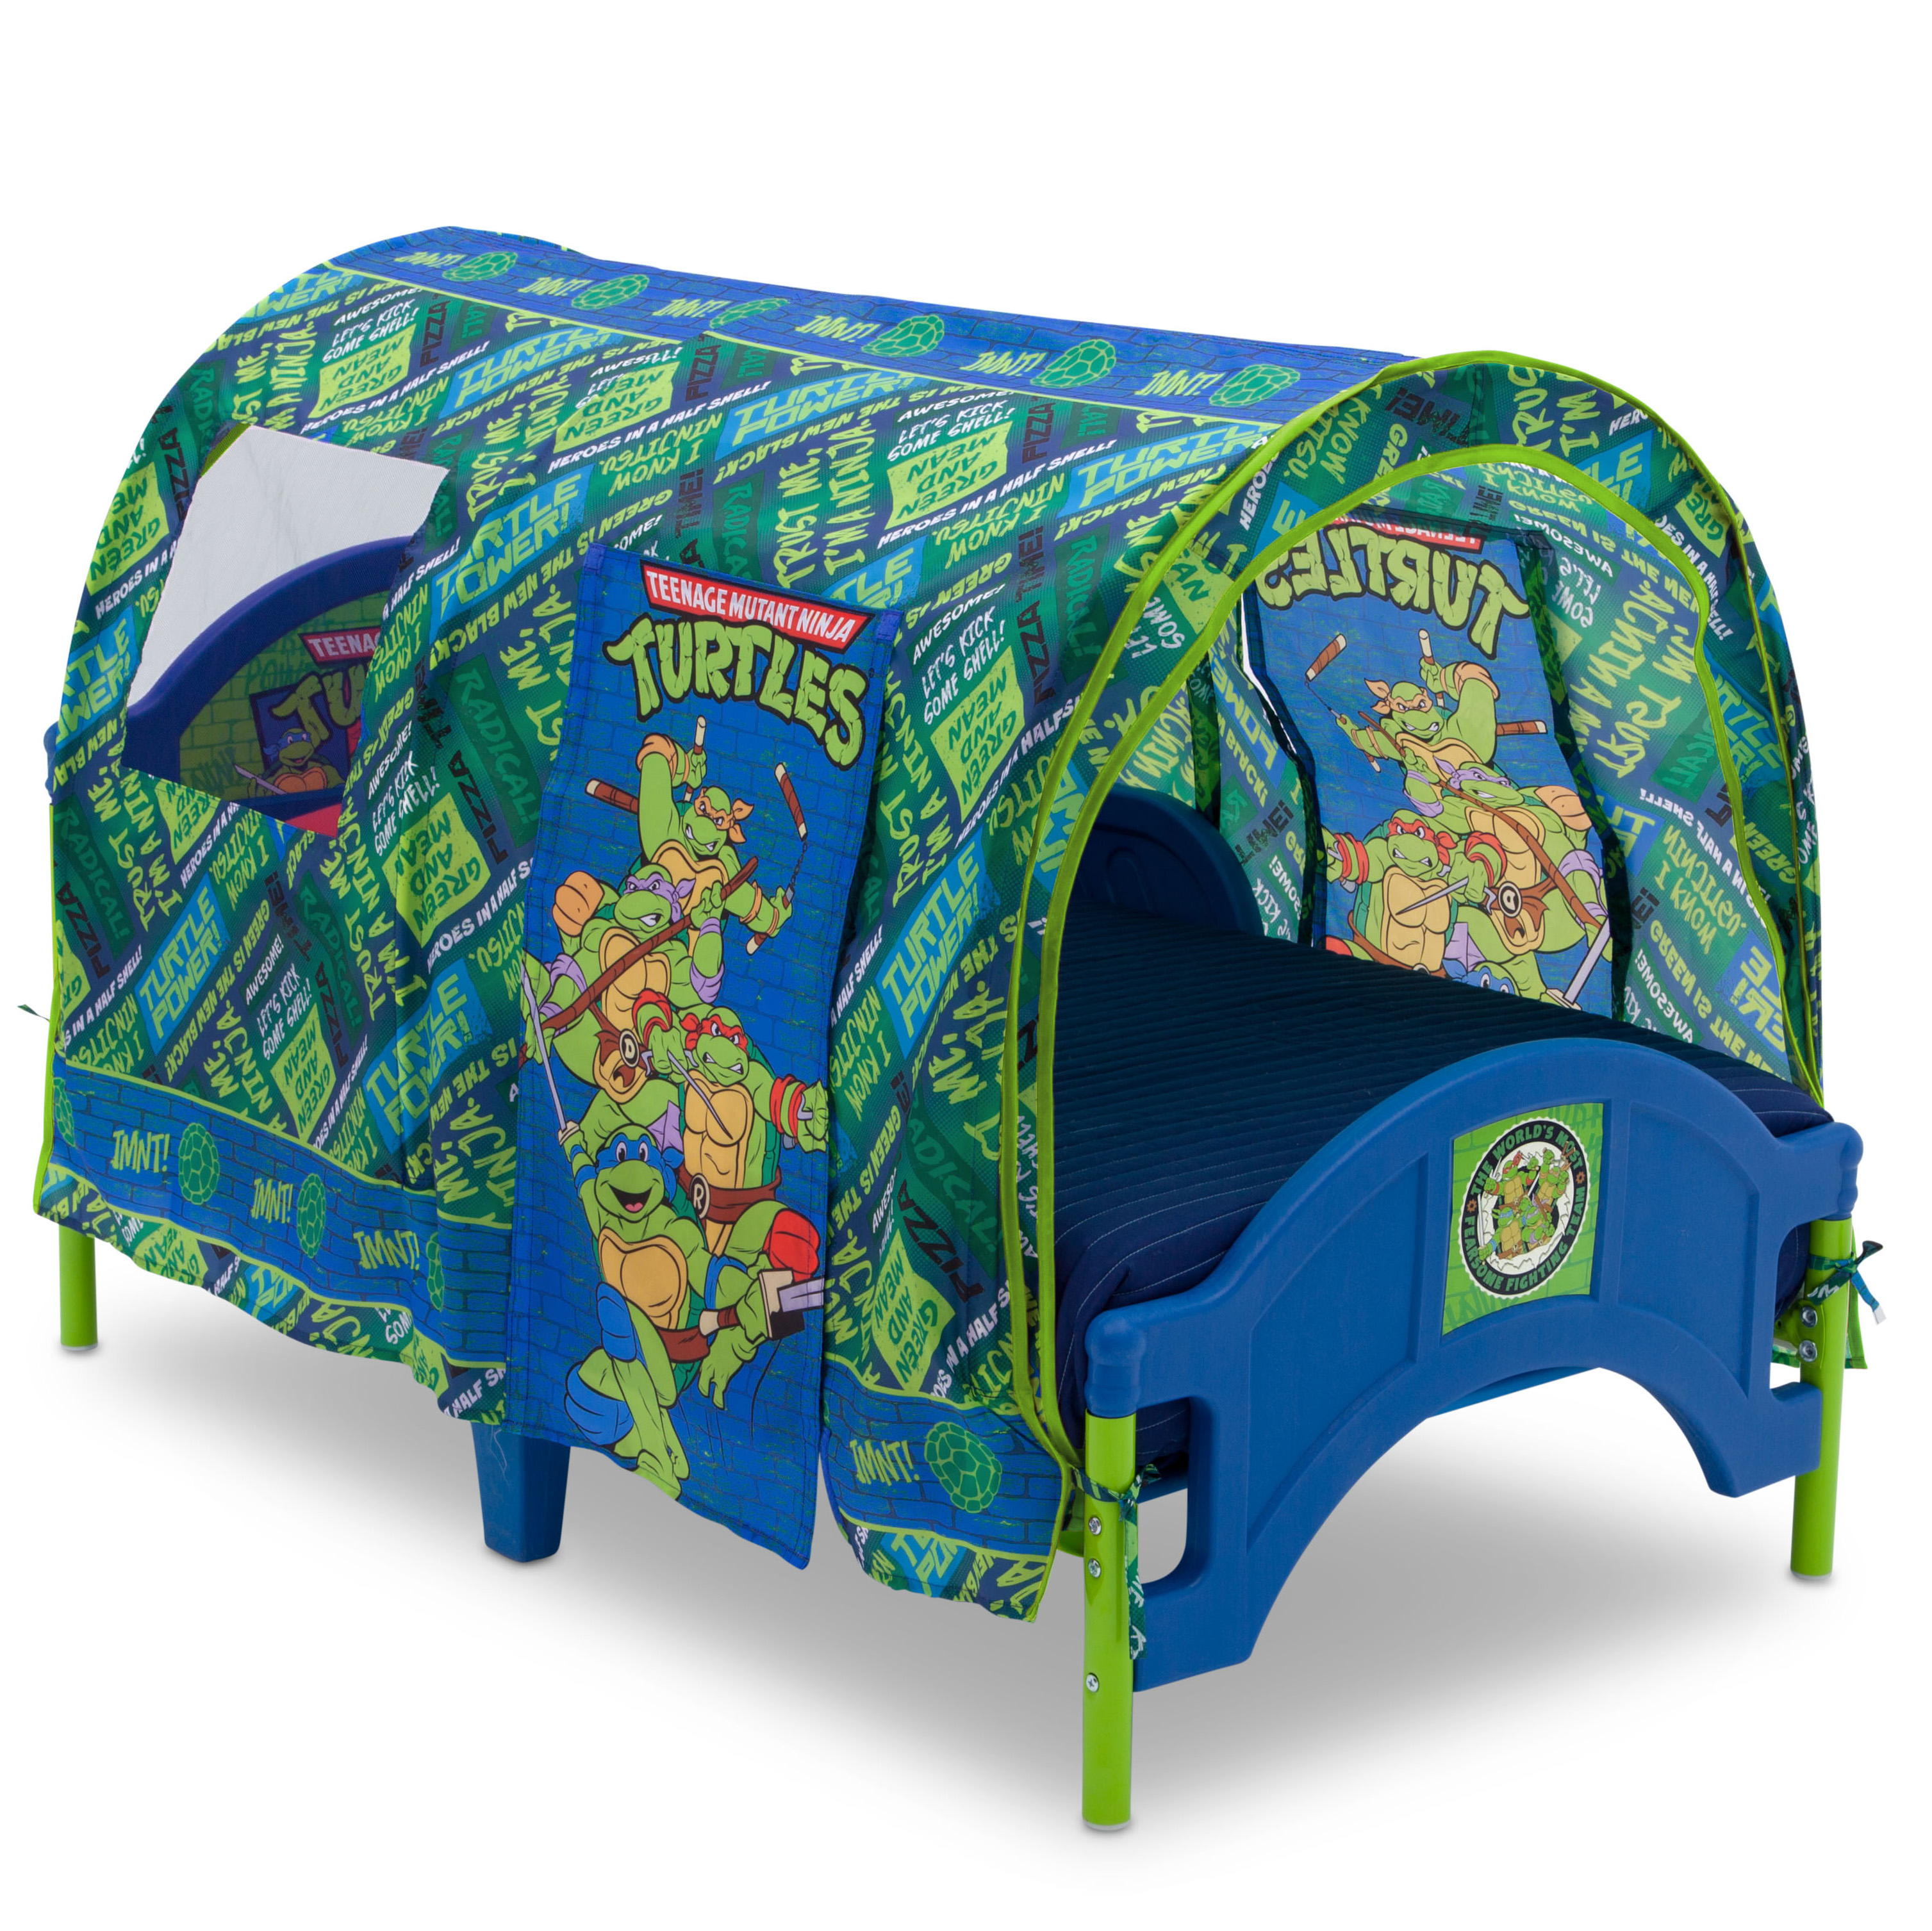 Teenage Mutant Ninja Turtles Plastic Toddler Bed with Tent by Delta Children